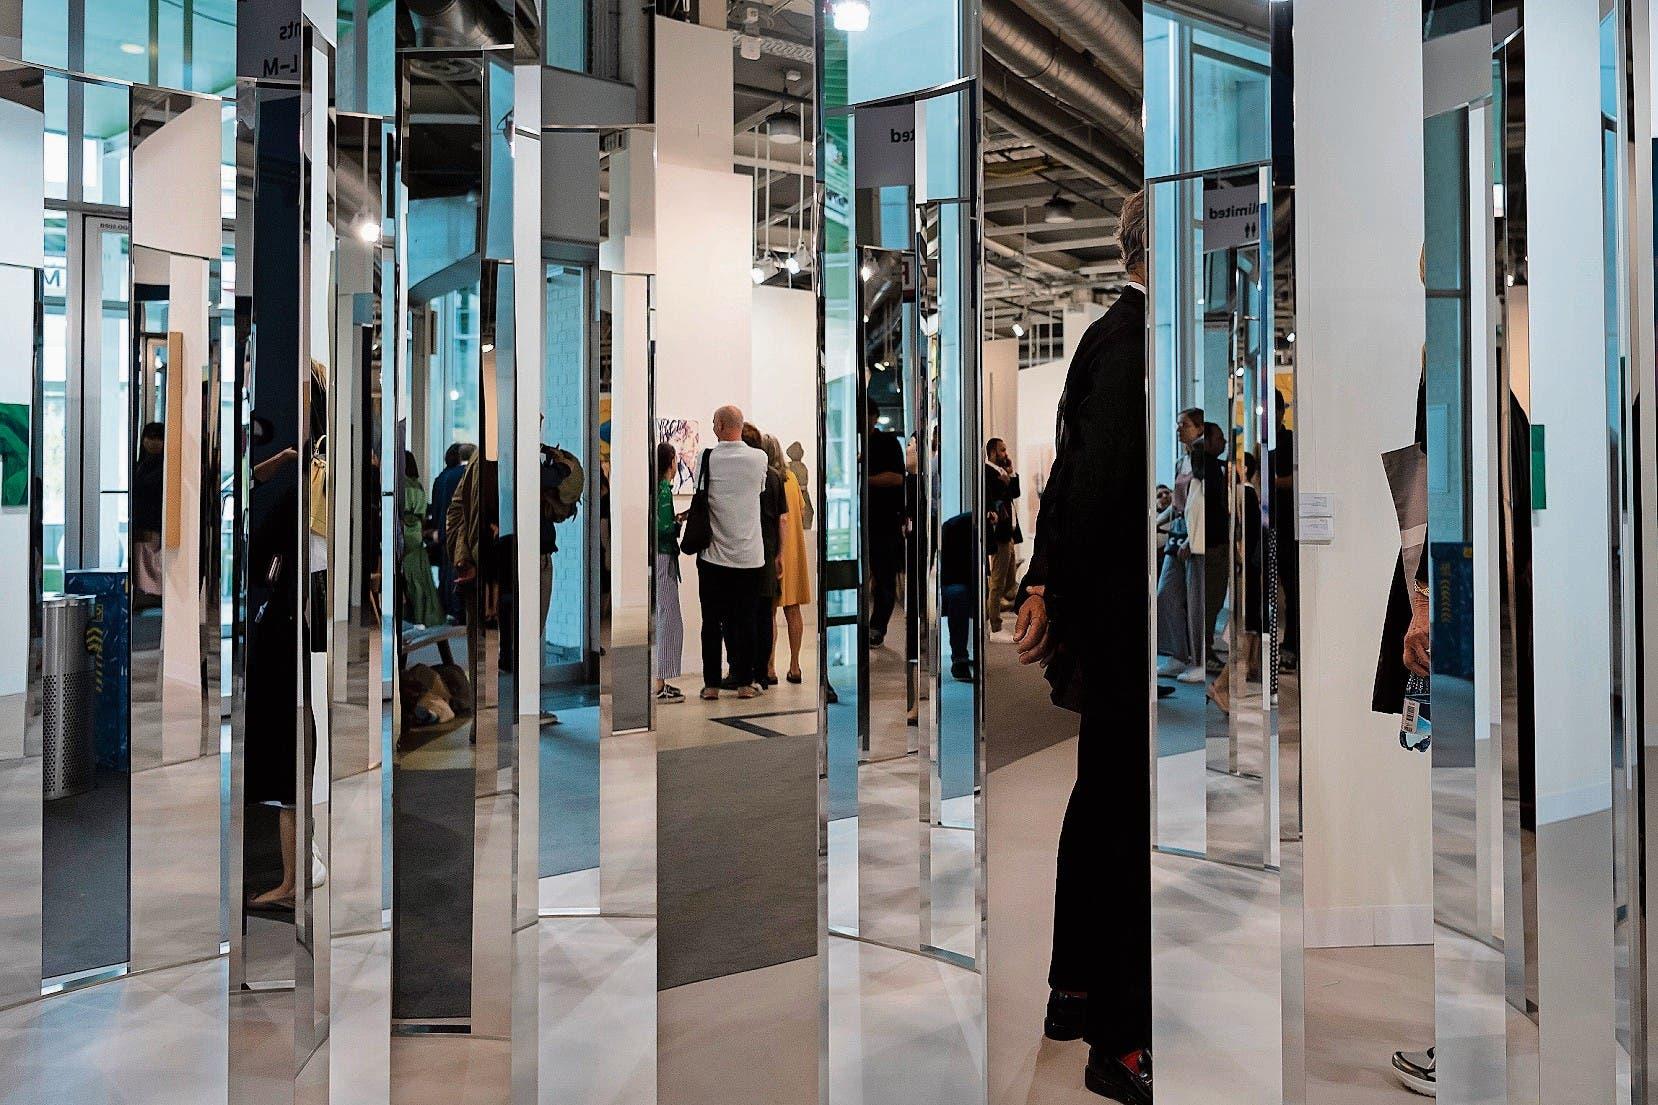 90 Prozent der Besucher der Art Basel kauften keine Kunst, sagt Magnus Resch. (Bild: Georgios Kefalas/Keystone (Basel, 12. Juni 2018))